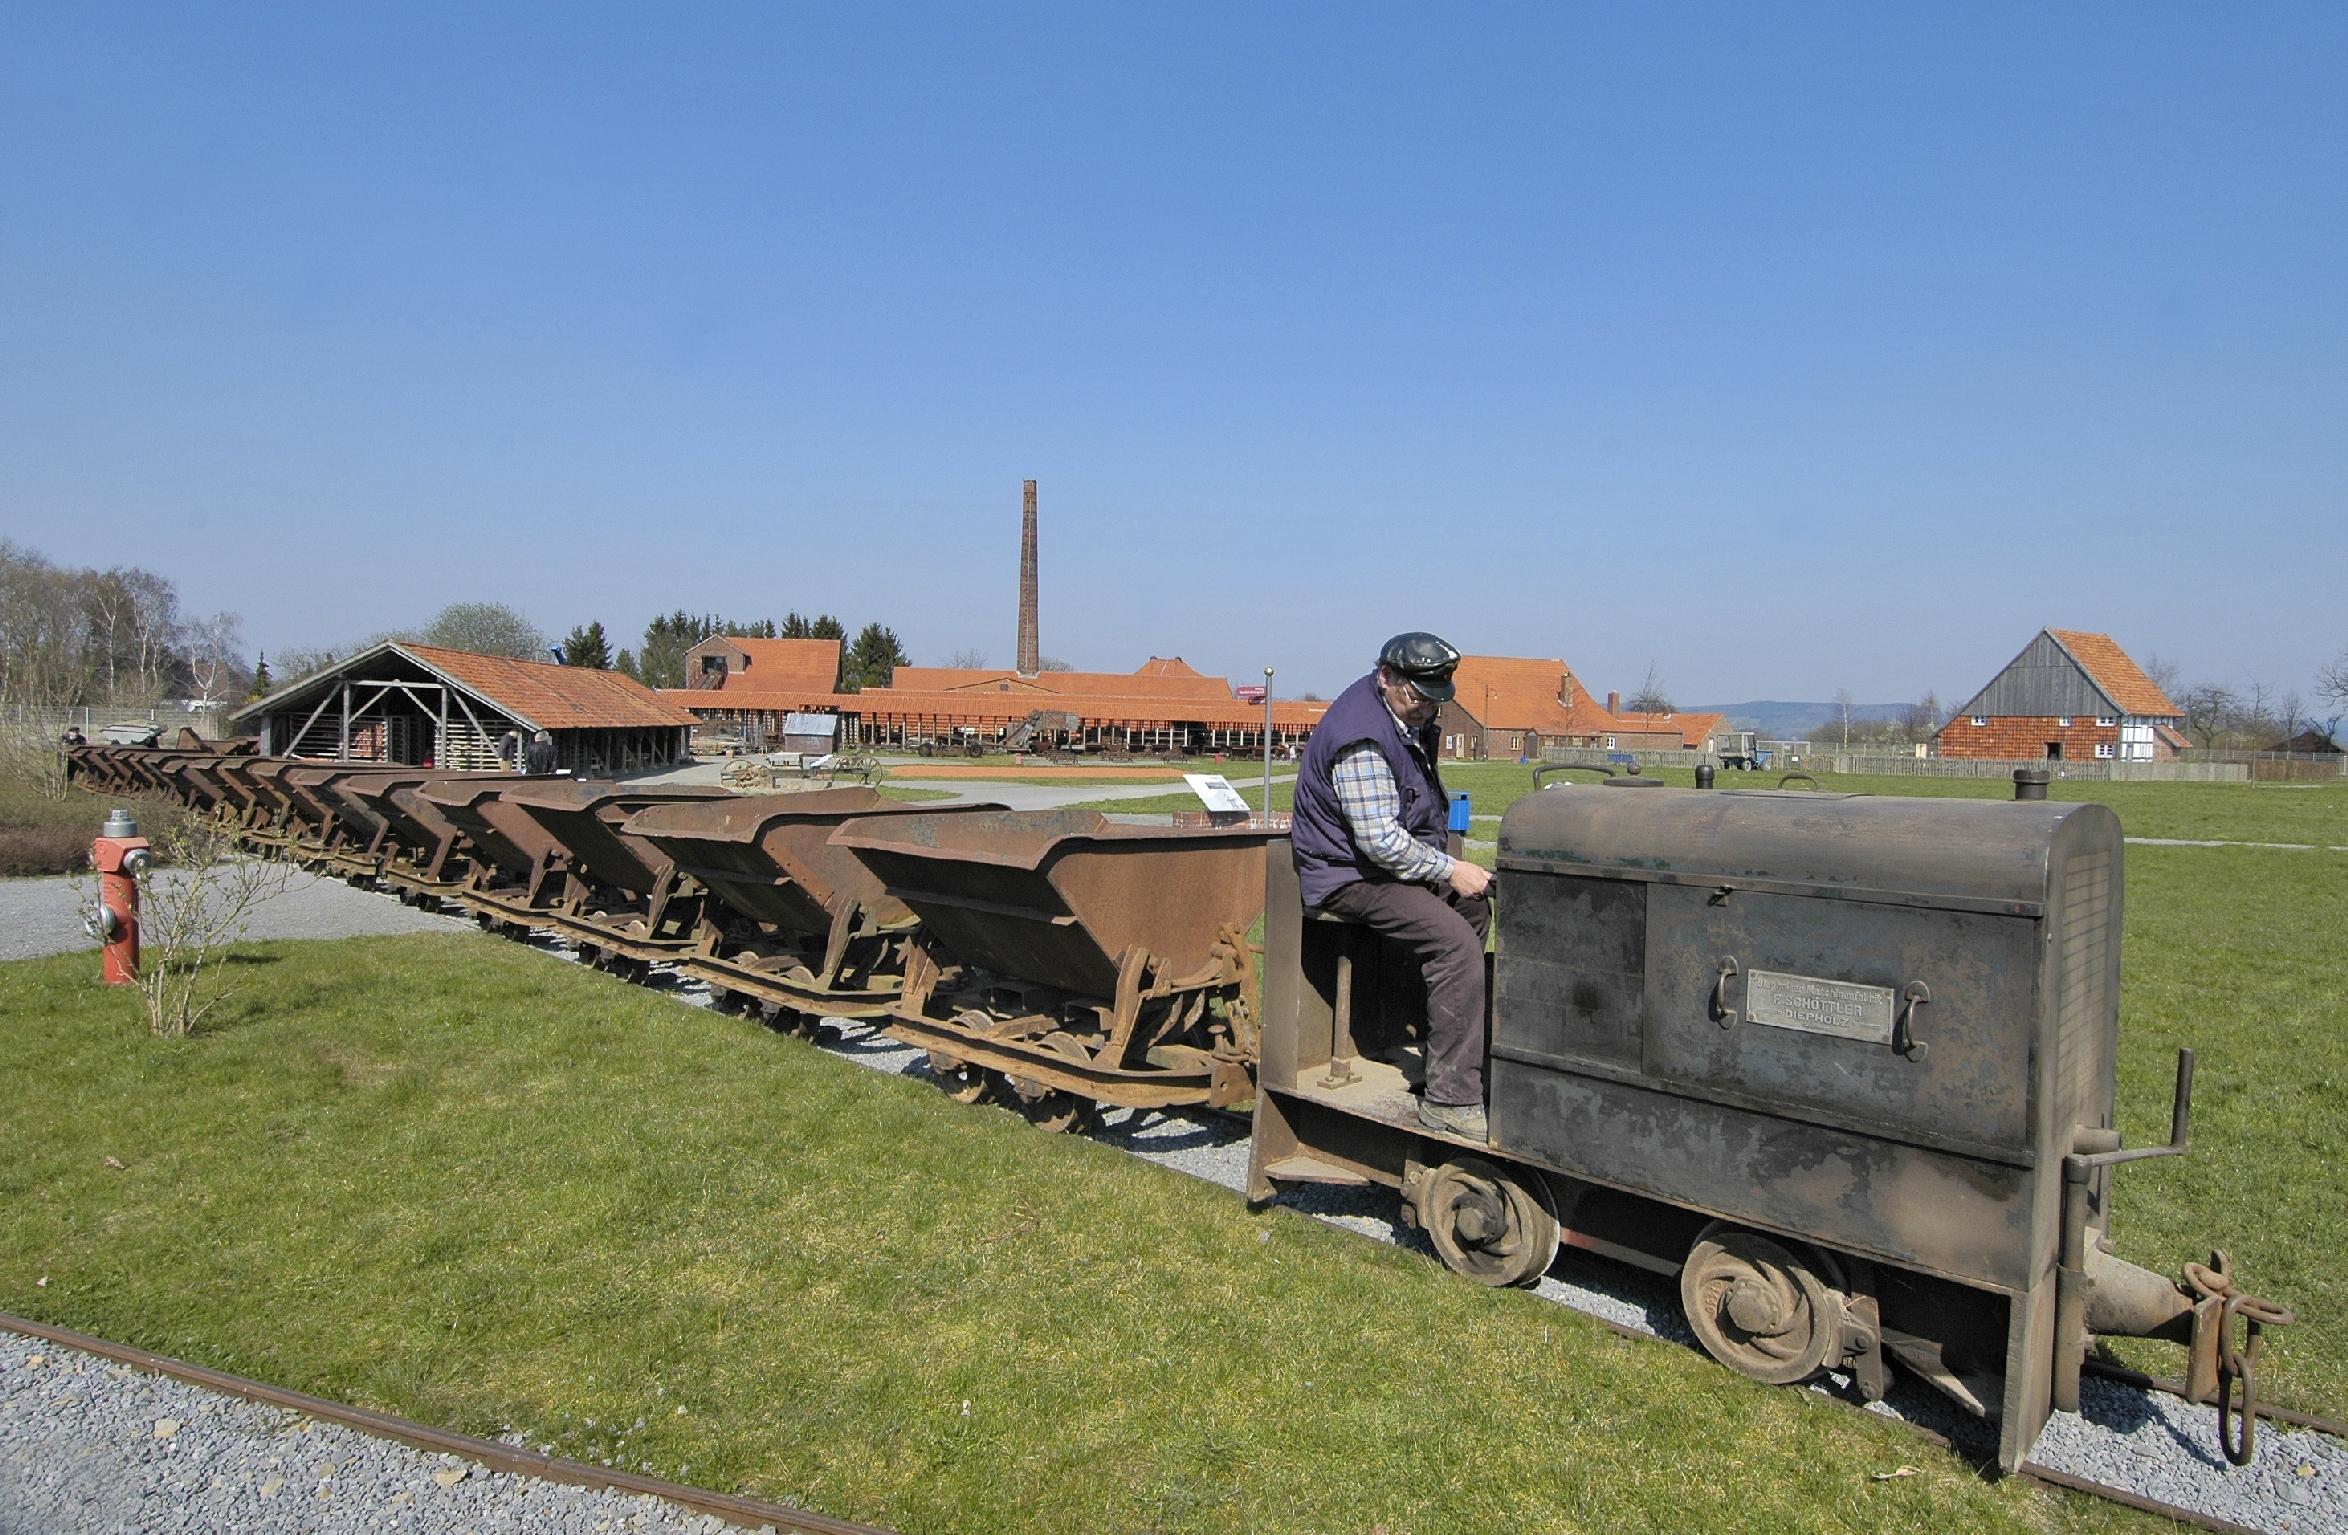 LWL-Industriemuseum Lage: Lehmtransport